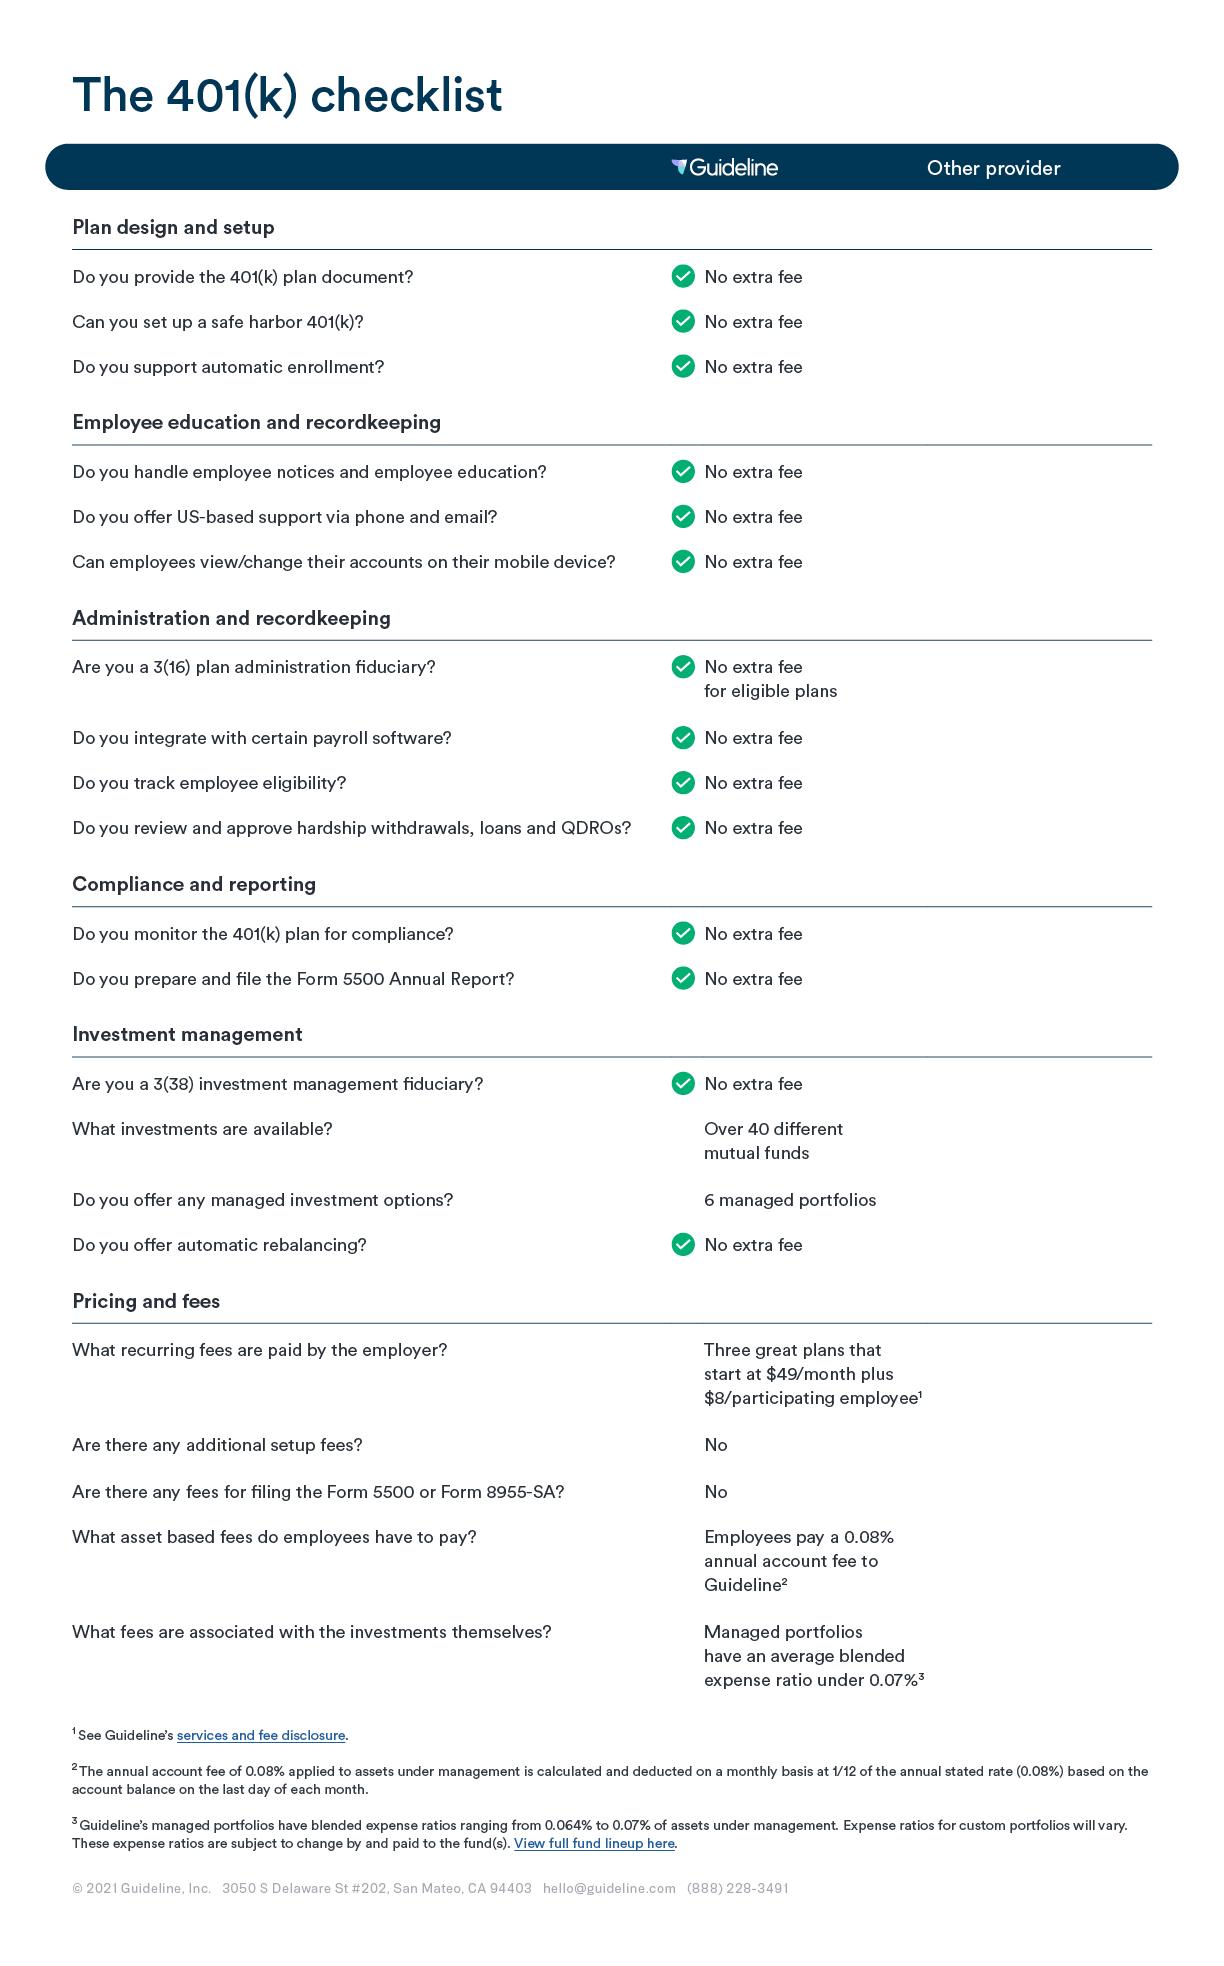 401k_Checklist_041421-11